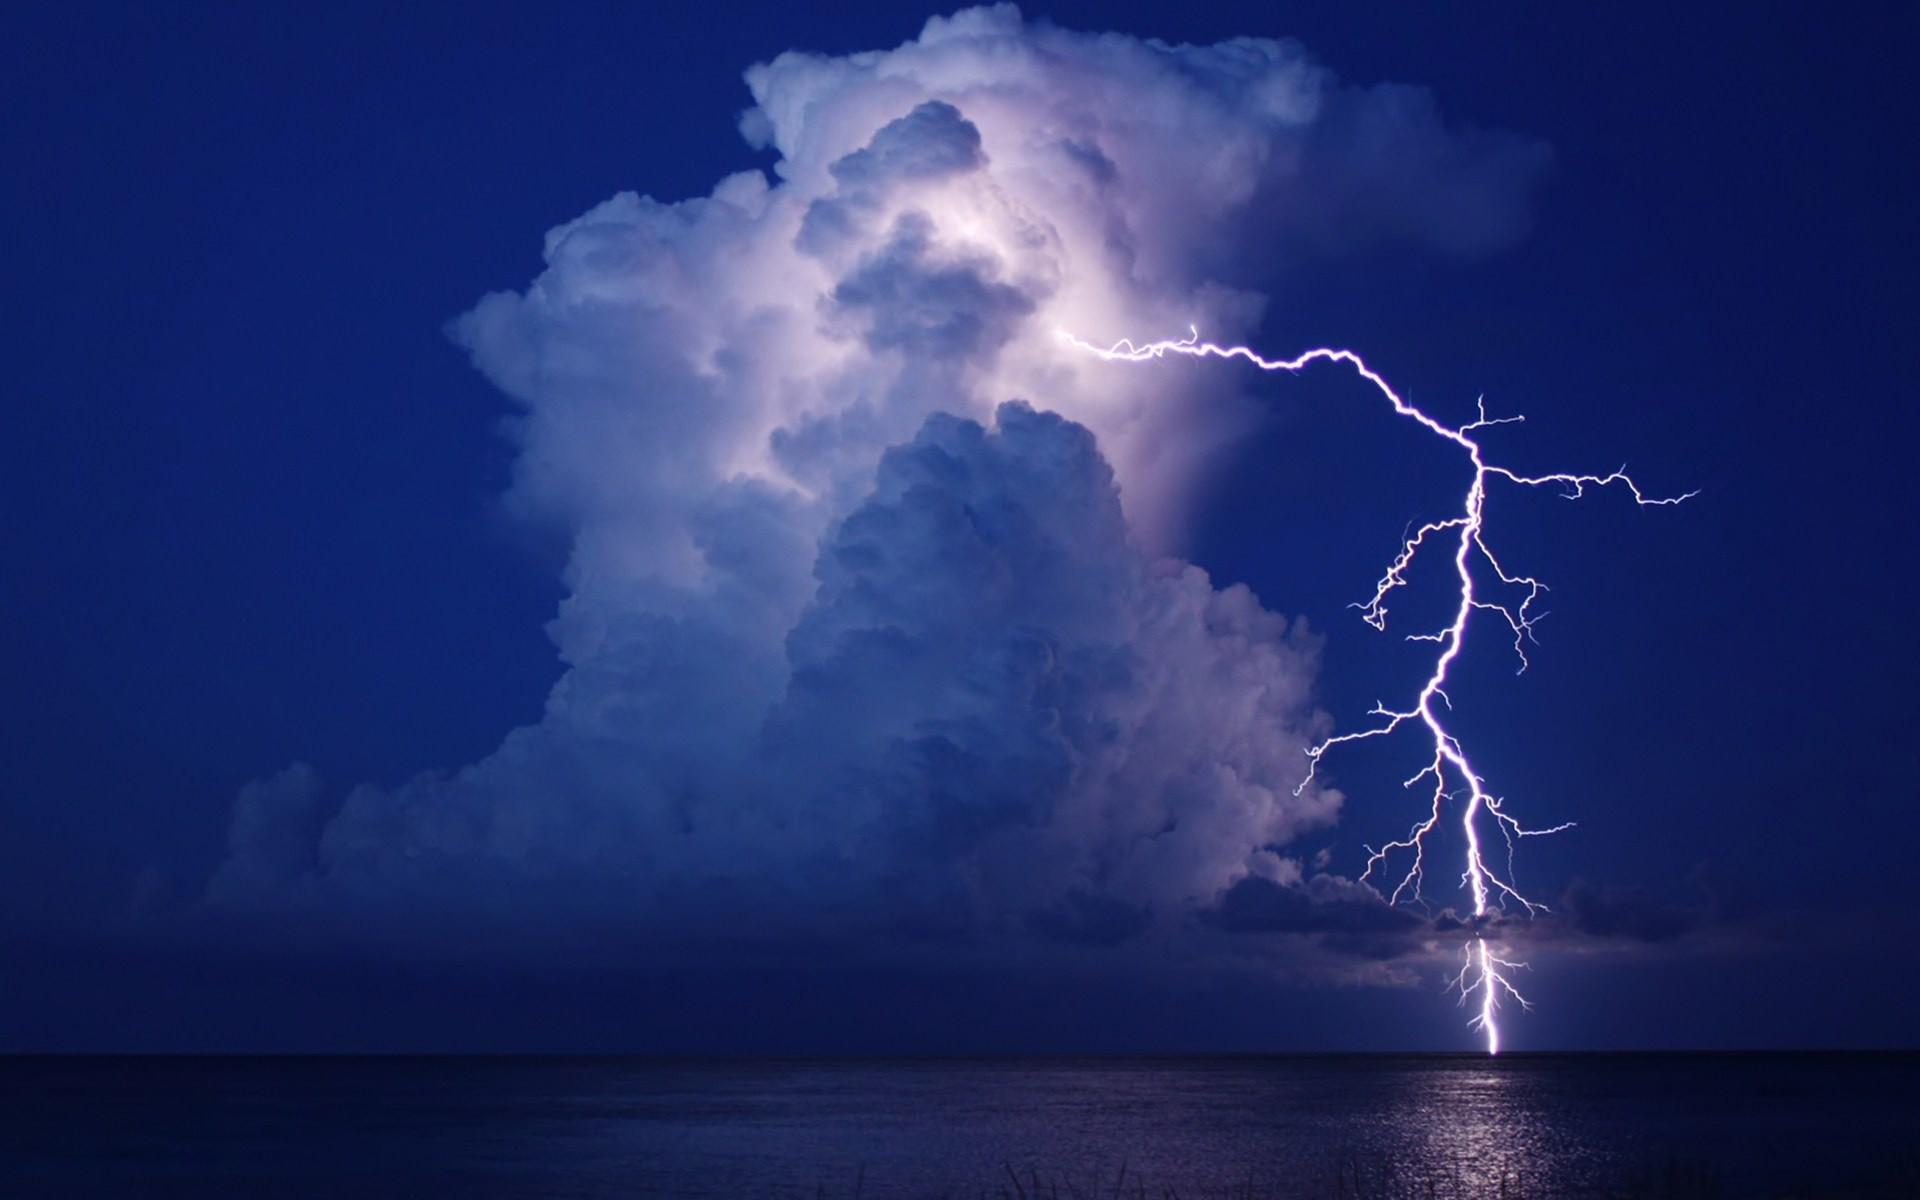 Lightning cloud night water storm reflection sea ocean f wallpaper      195281   WallpaperUP